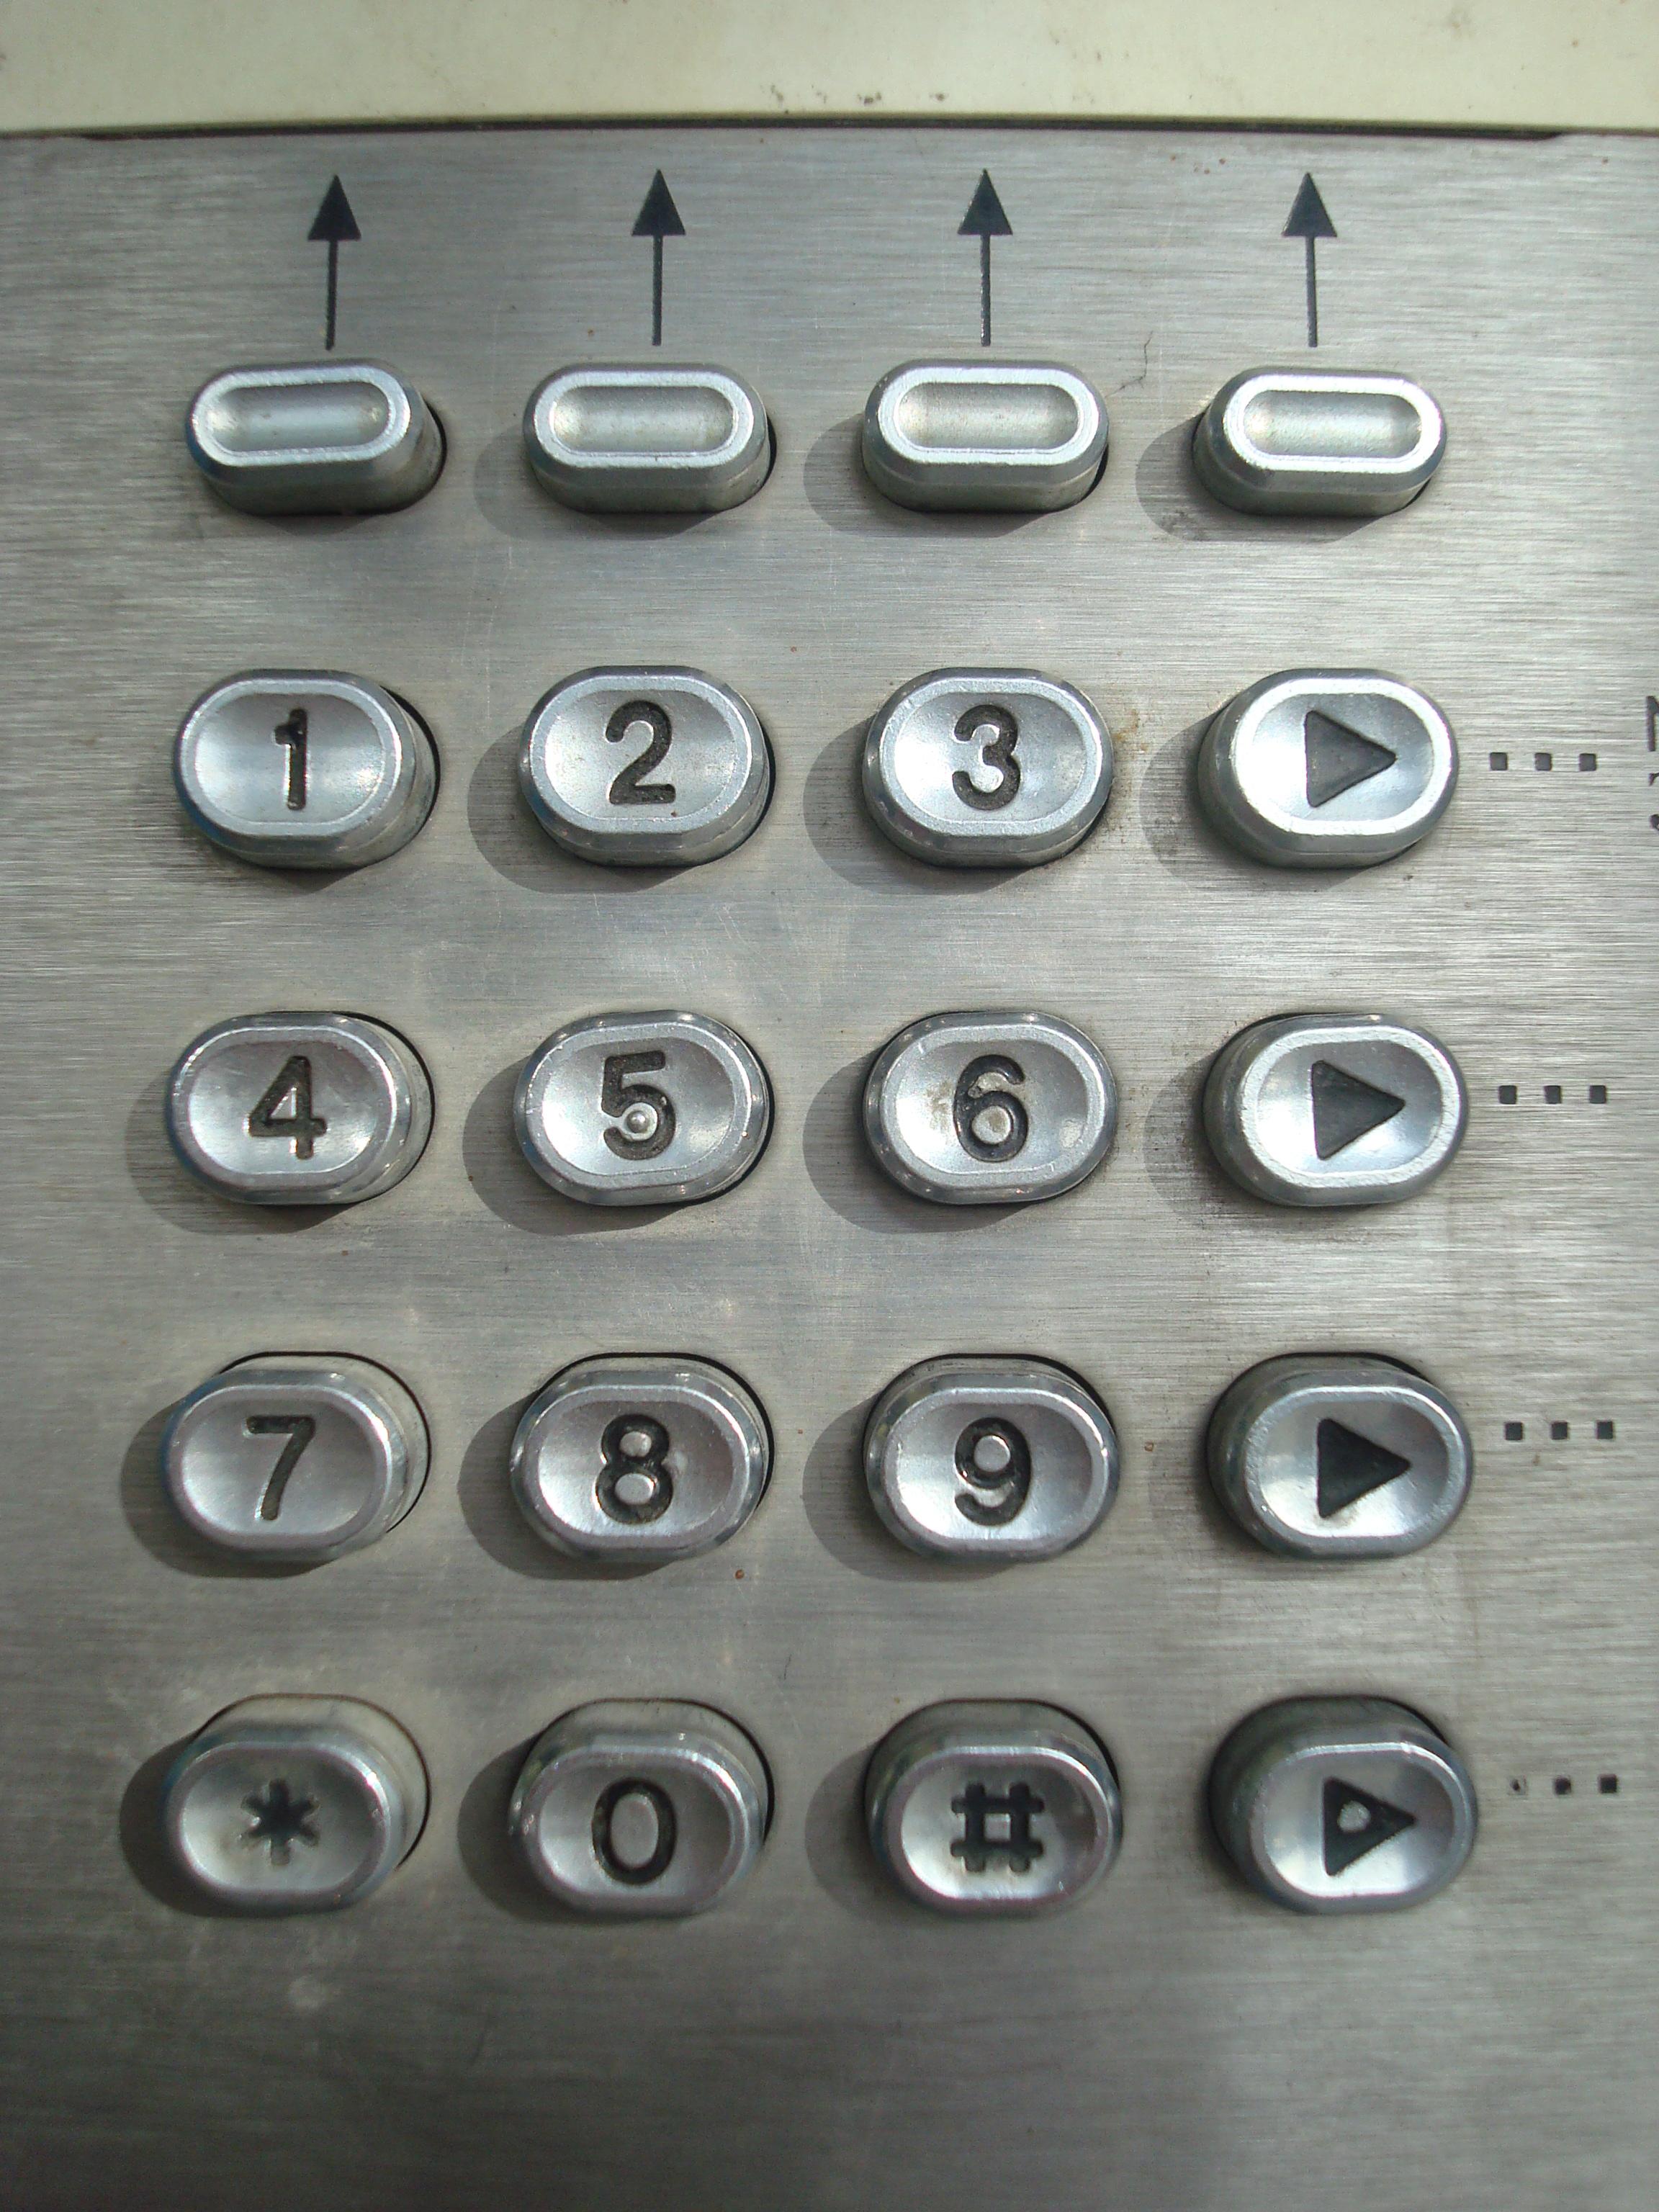 Free photo: Metal phone dial-pad - Seven, Phone, One - Free